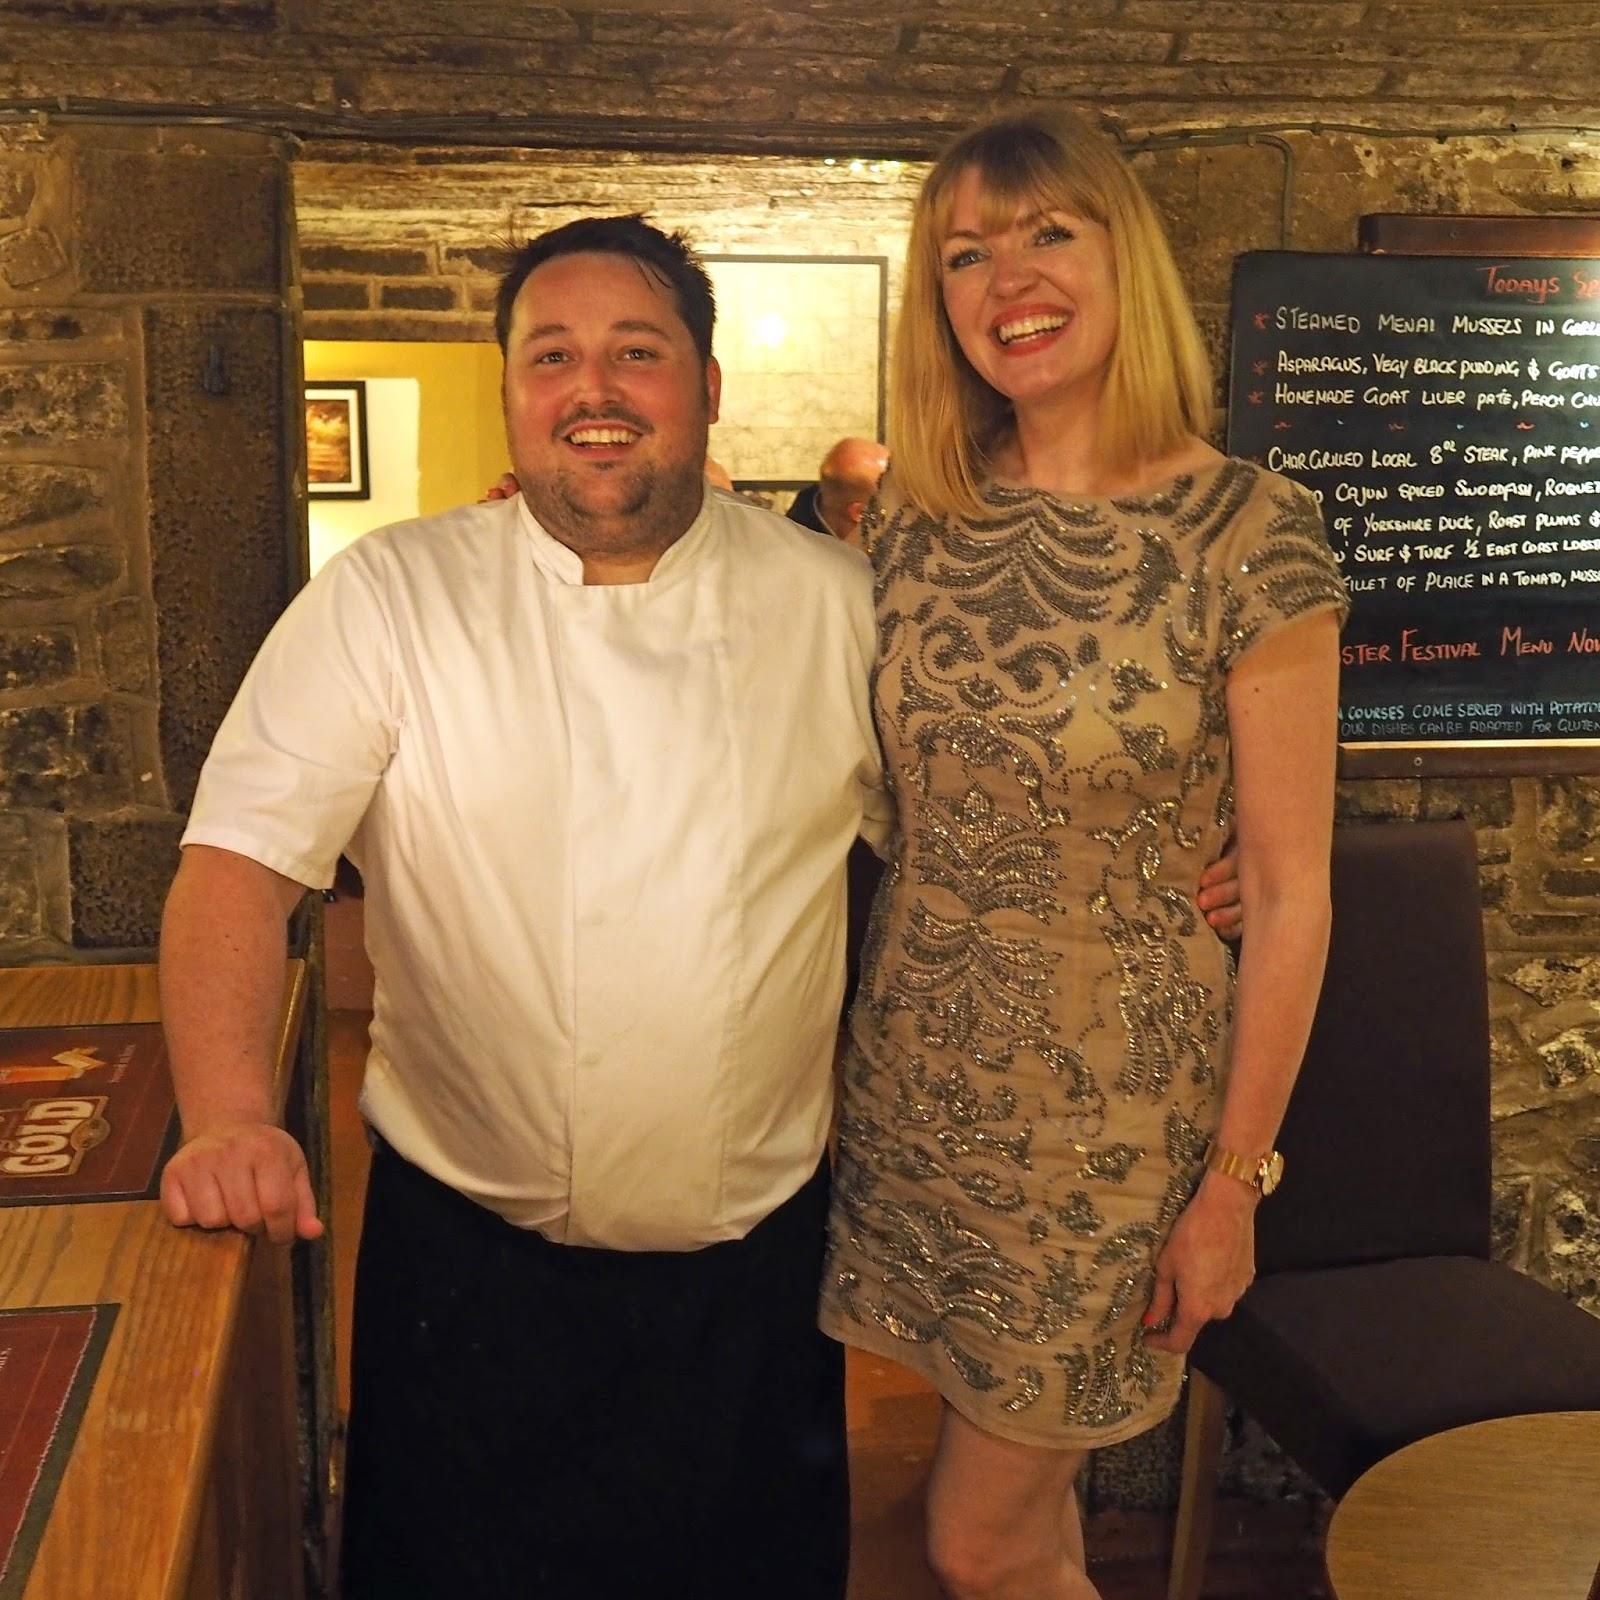 Elizabeth Yeowart with Mark Byron, head chef and owner of Le Caveau, Skipton